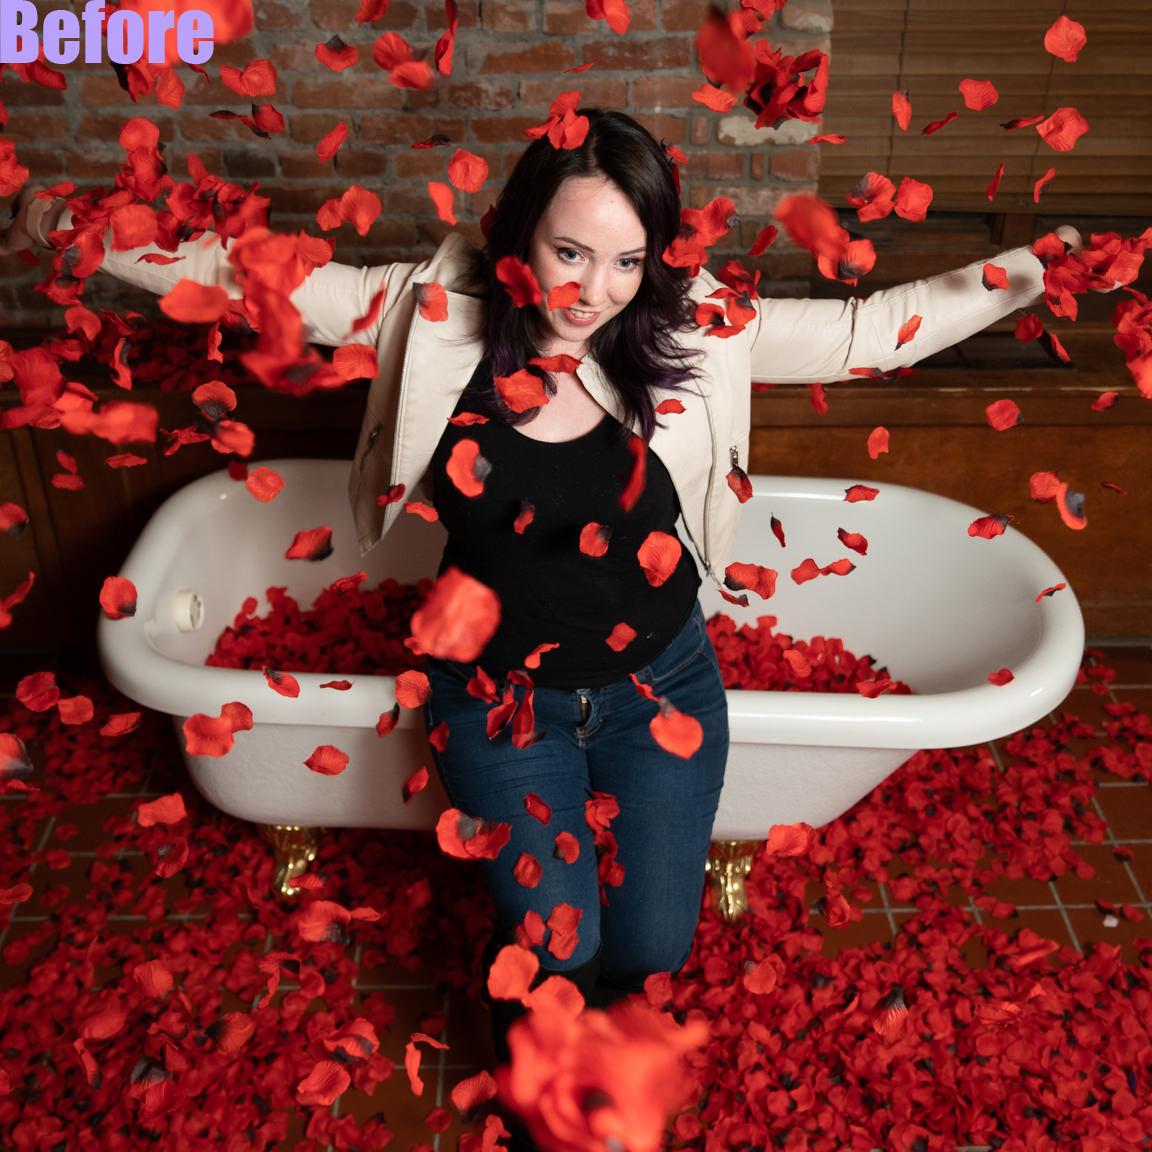 before edit-woman throwing roses